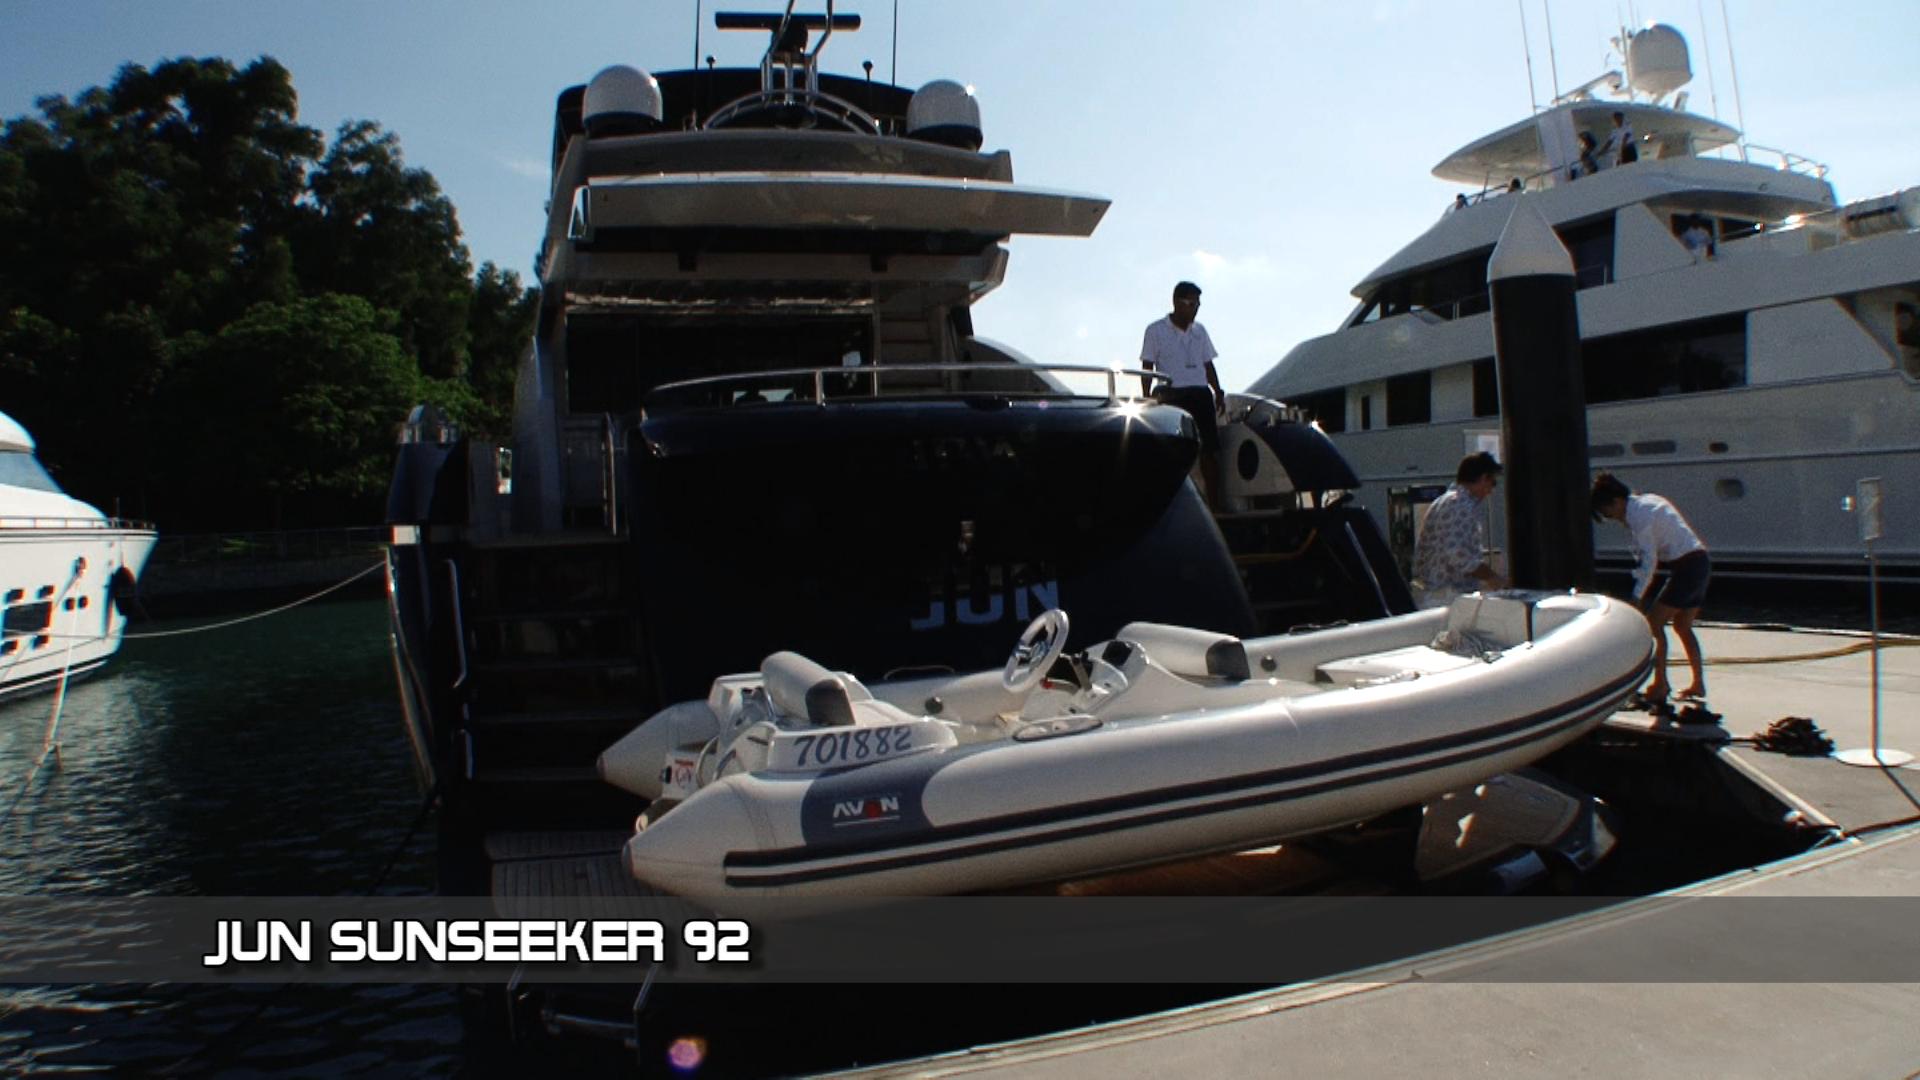 Boat Asia 2012 – Sunseeker Jun